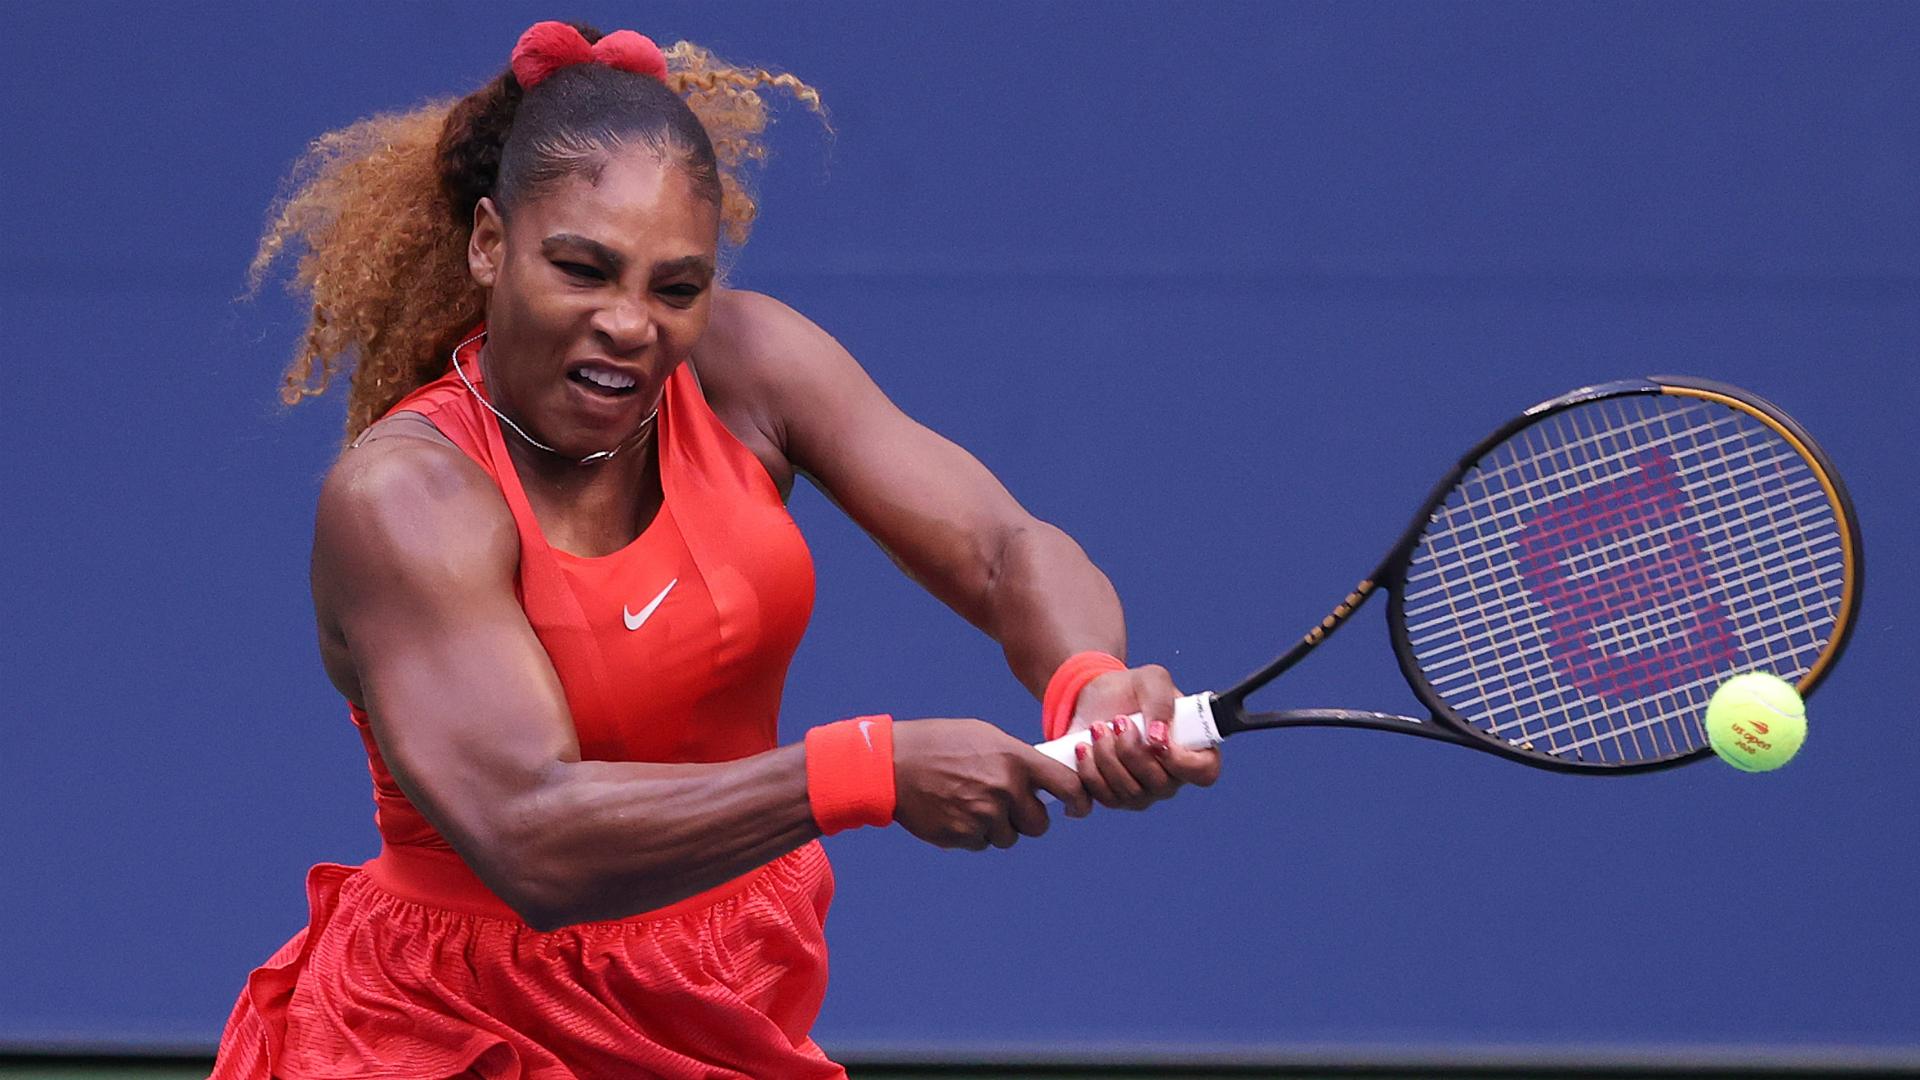 US Open 2020: Serena, Kenin advance but Venus suffers career first at Flushing Meadows